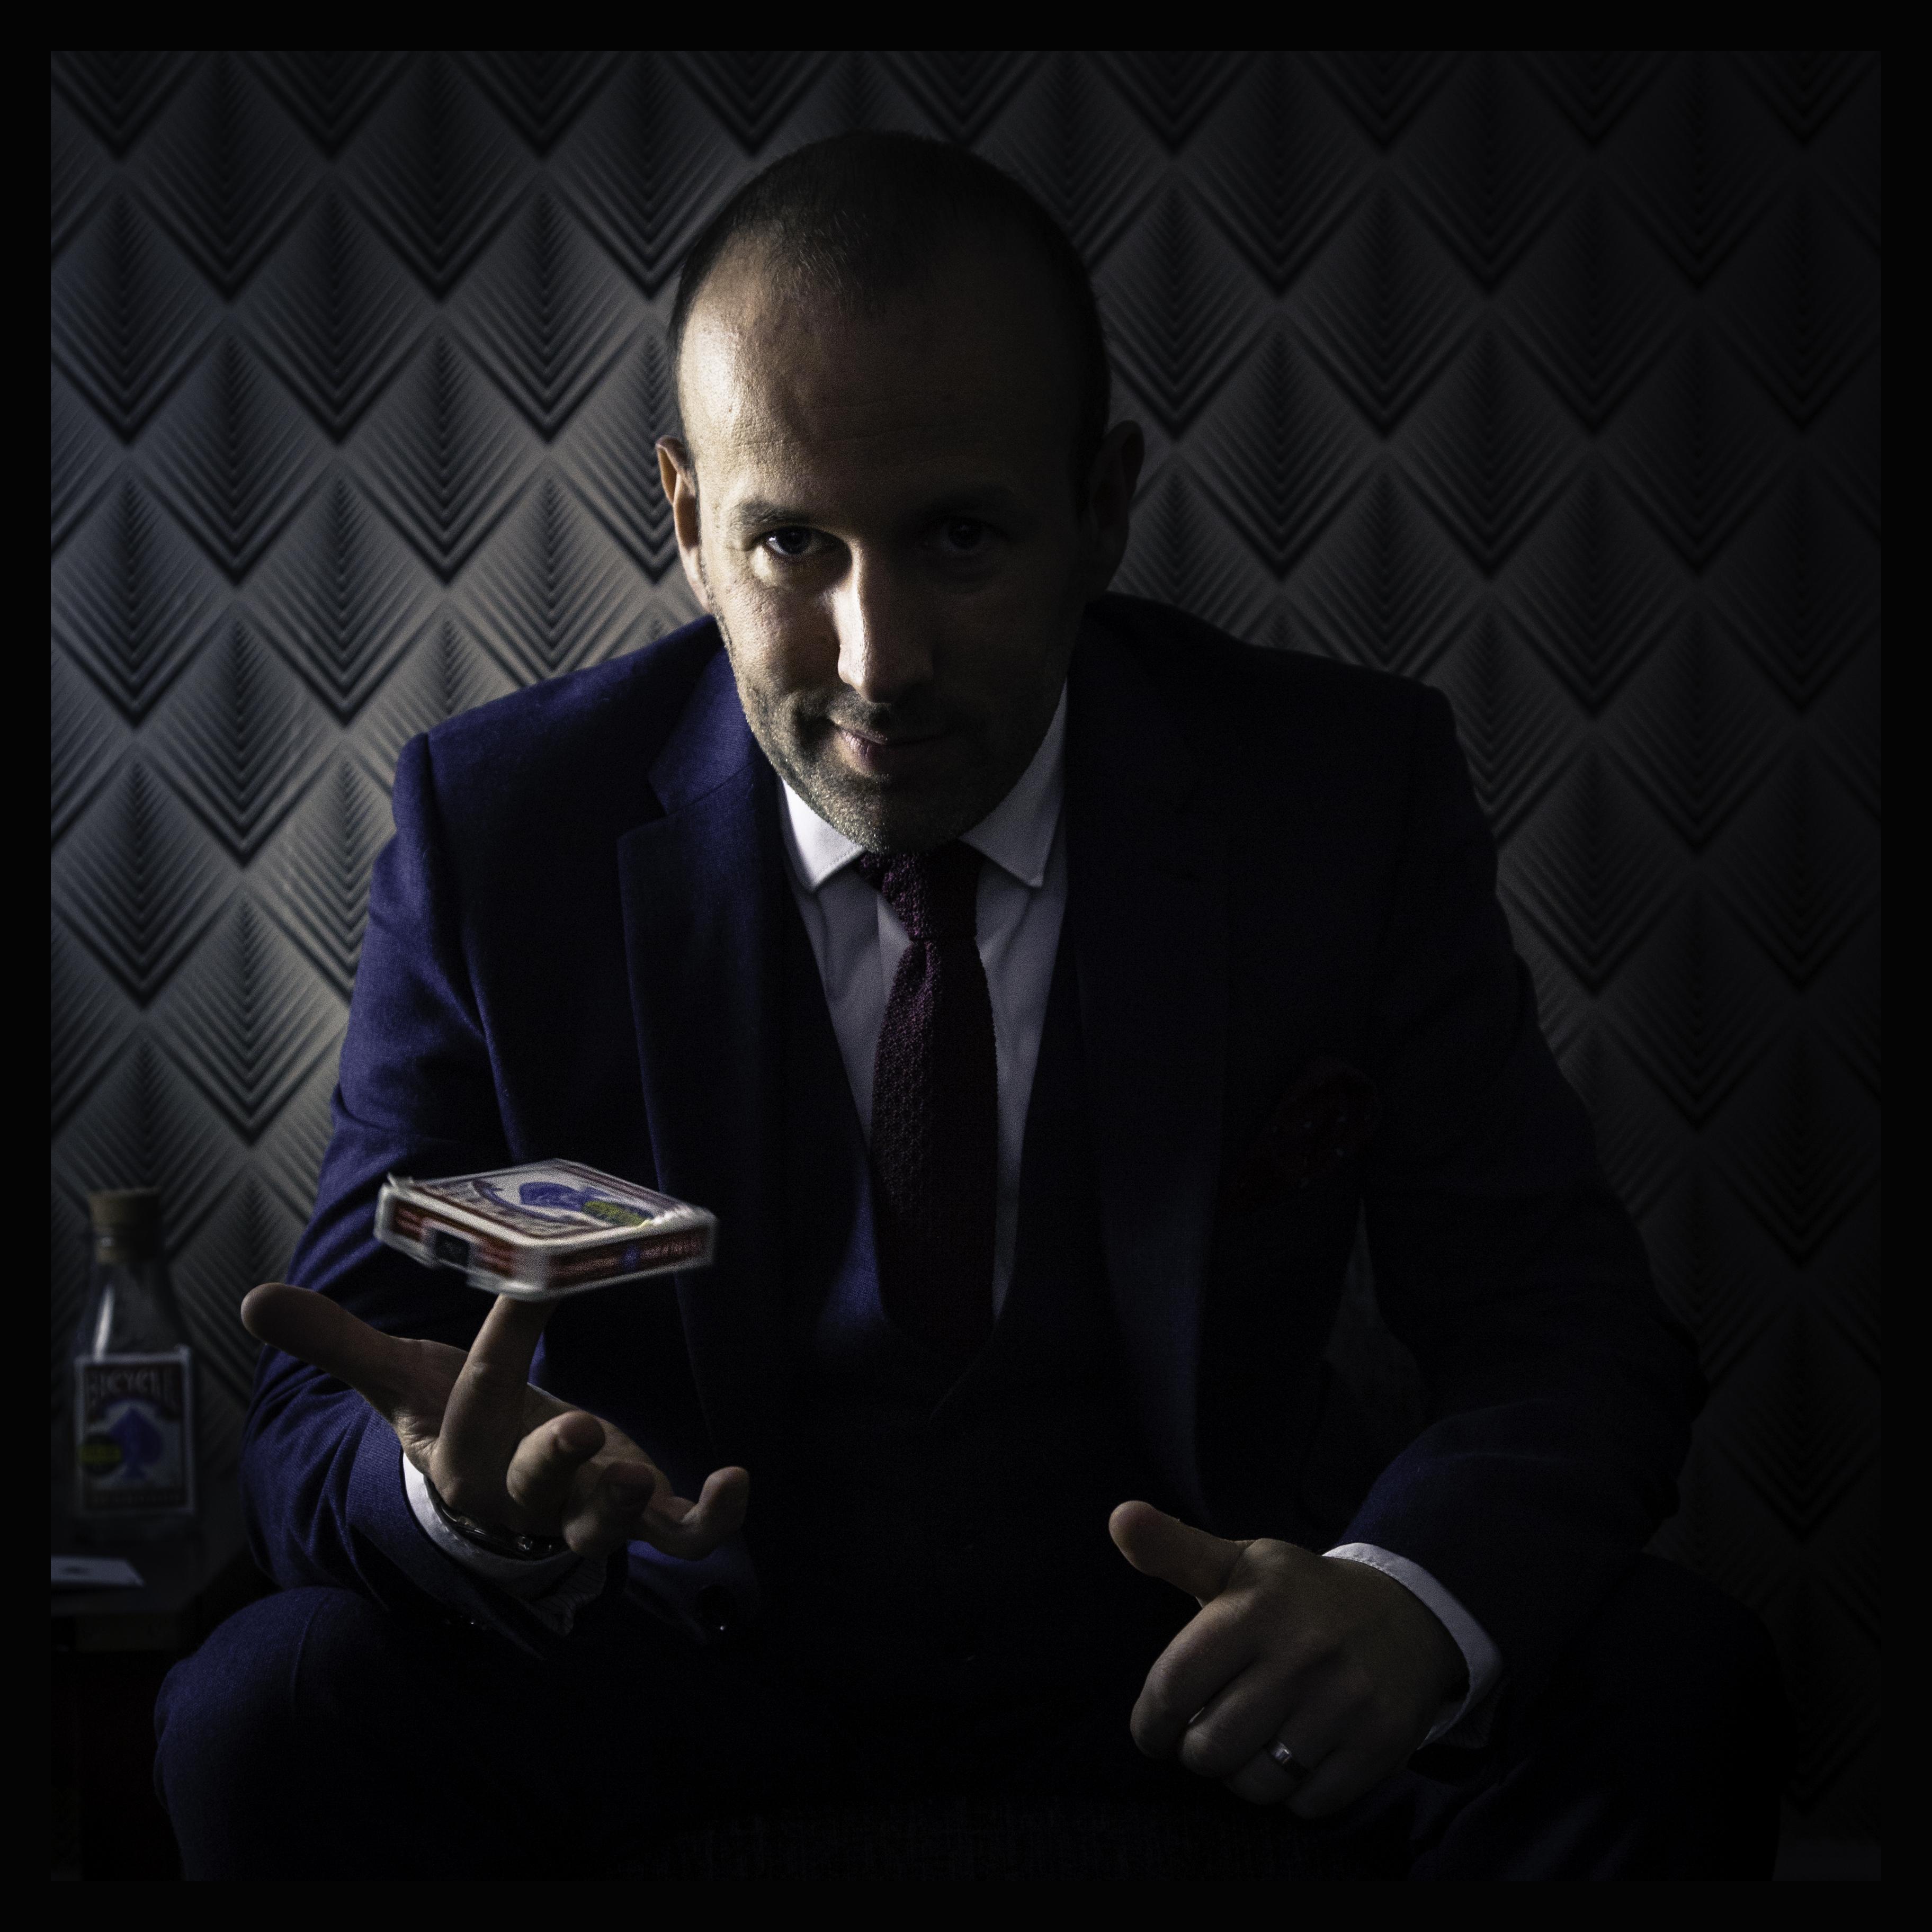 Liverpool Magician,Kev Dunn Magician